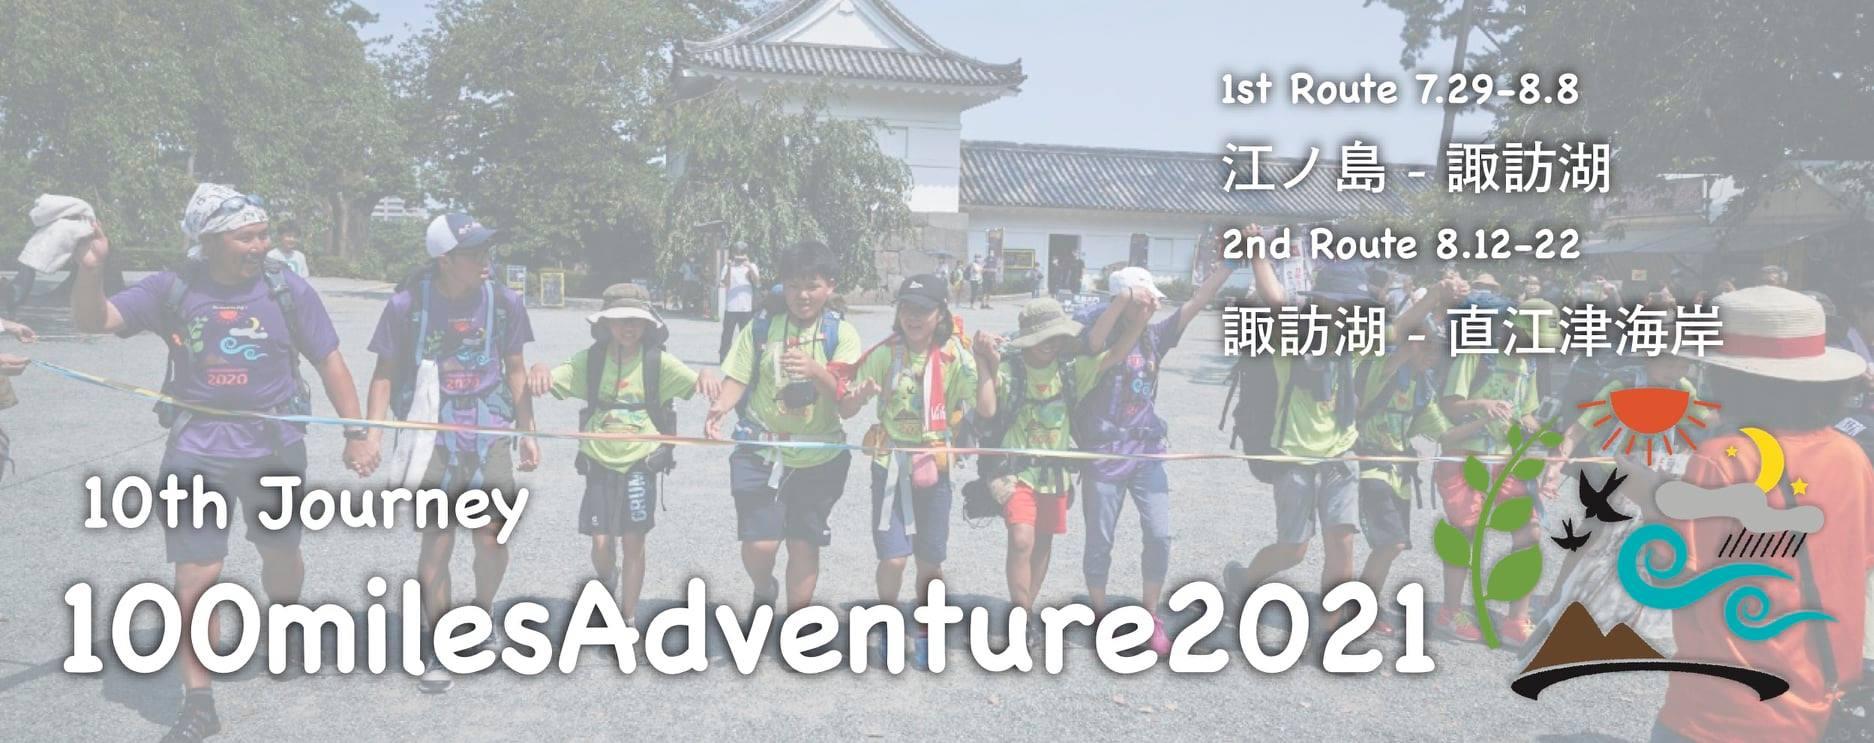 100milesAdventure2021参加申込み受付開始!